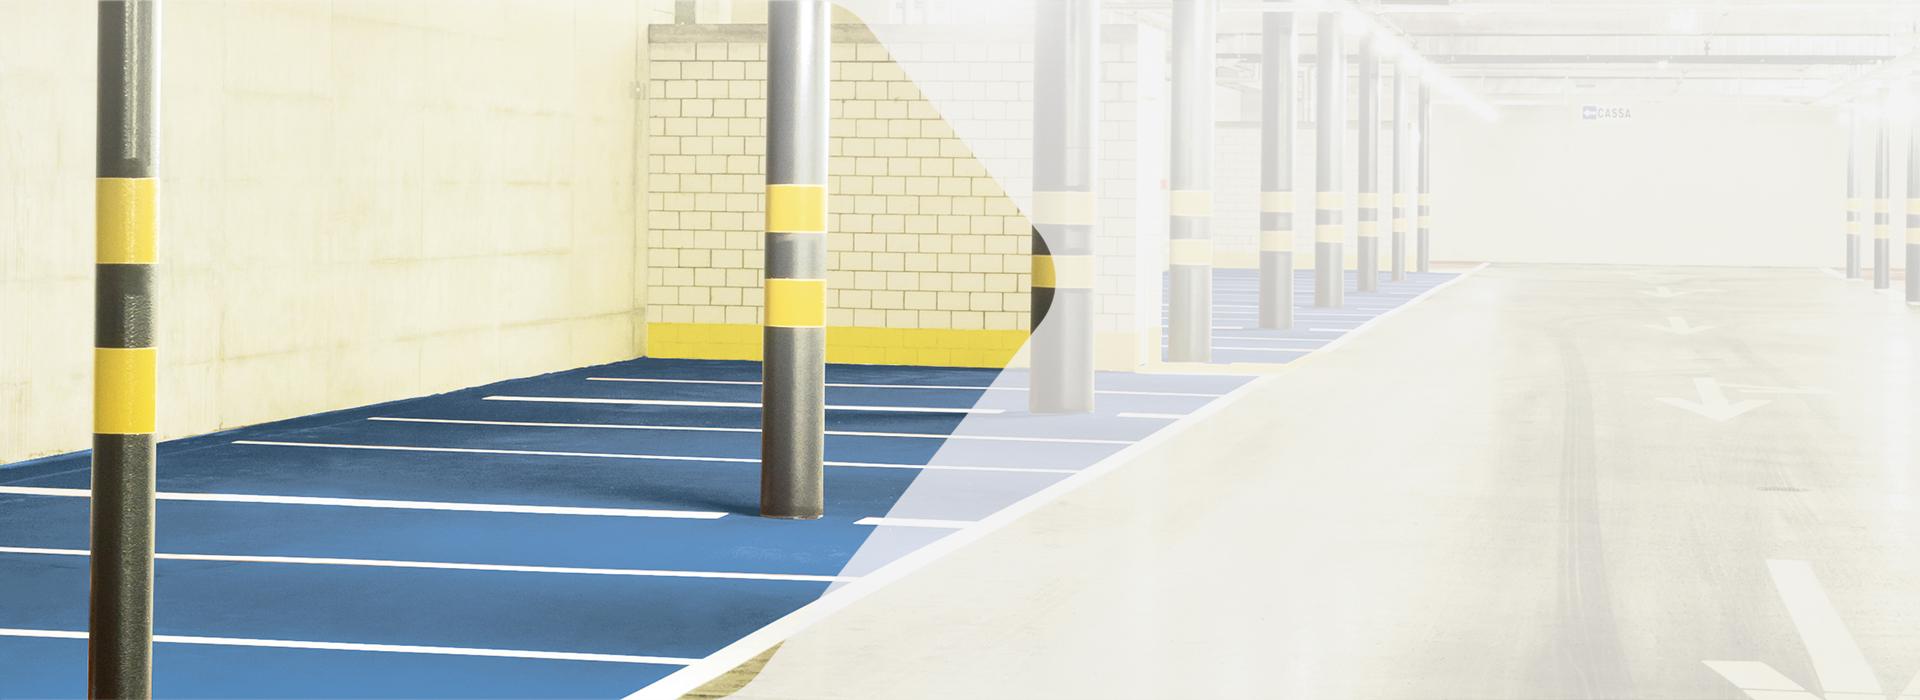 Hallen-/Indoor-Markierungen